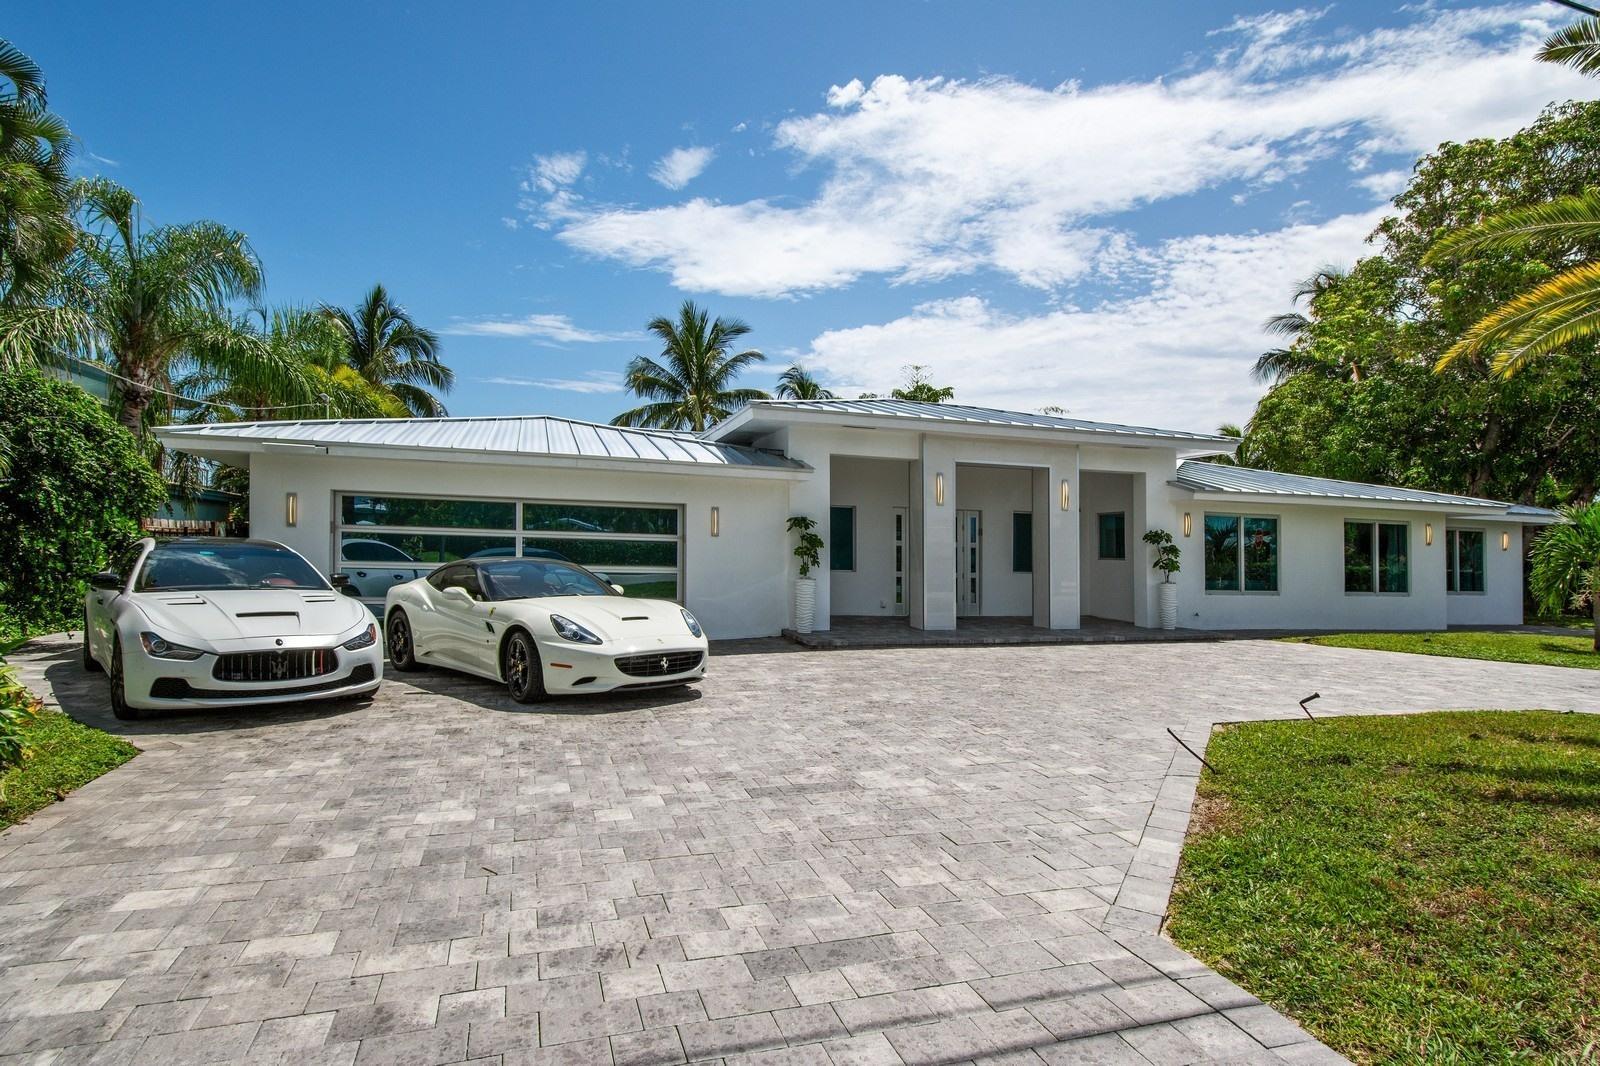 592 SE 15th Avenue - Deerfield Beach, Florida